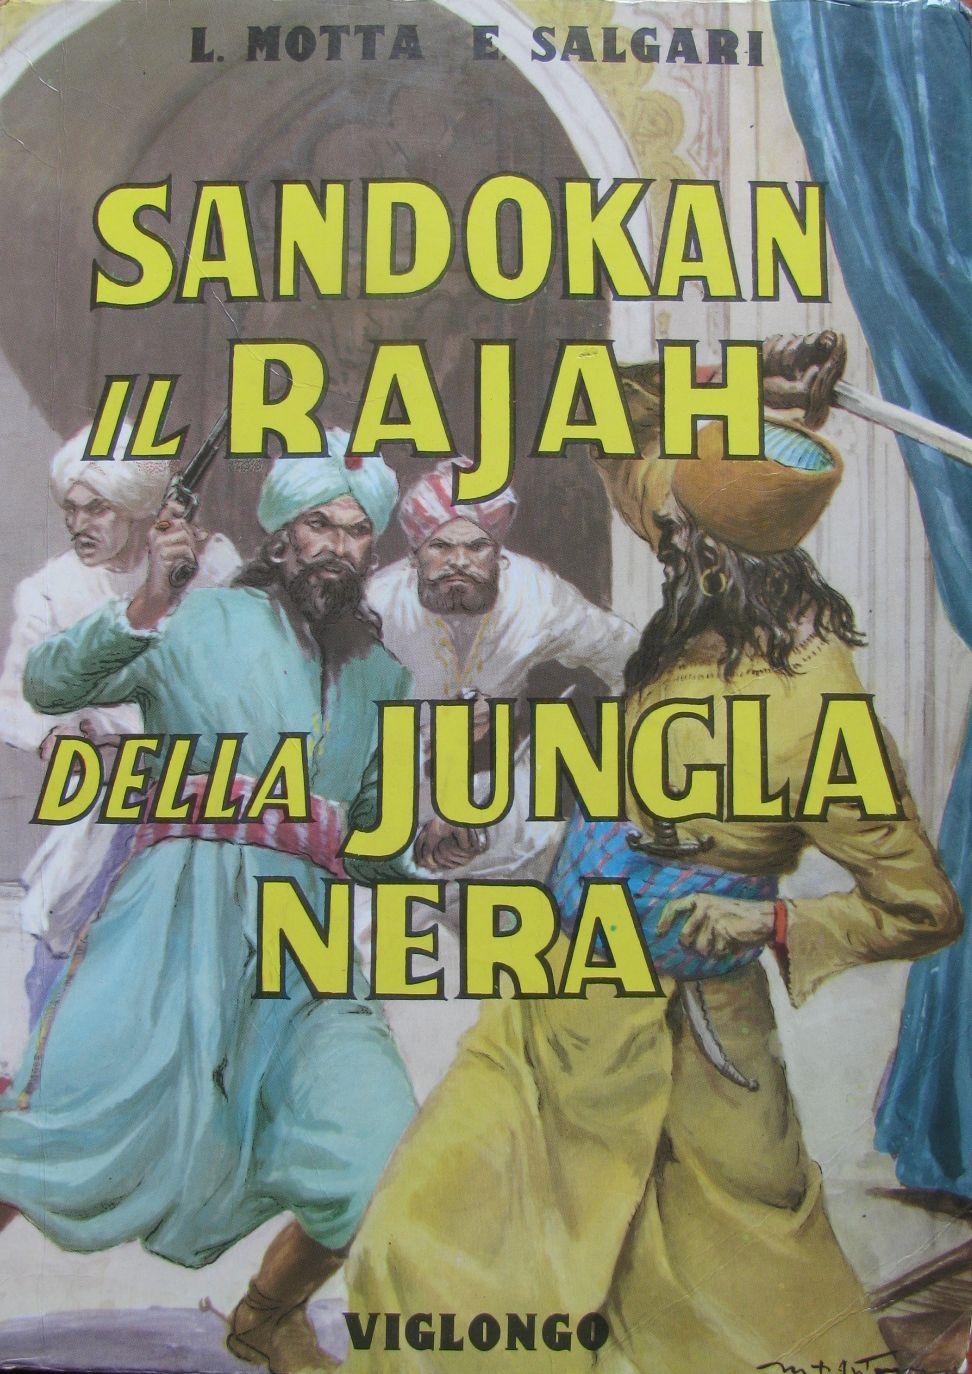 Sandokan il rajah della jungla nera